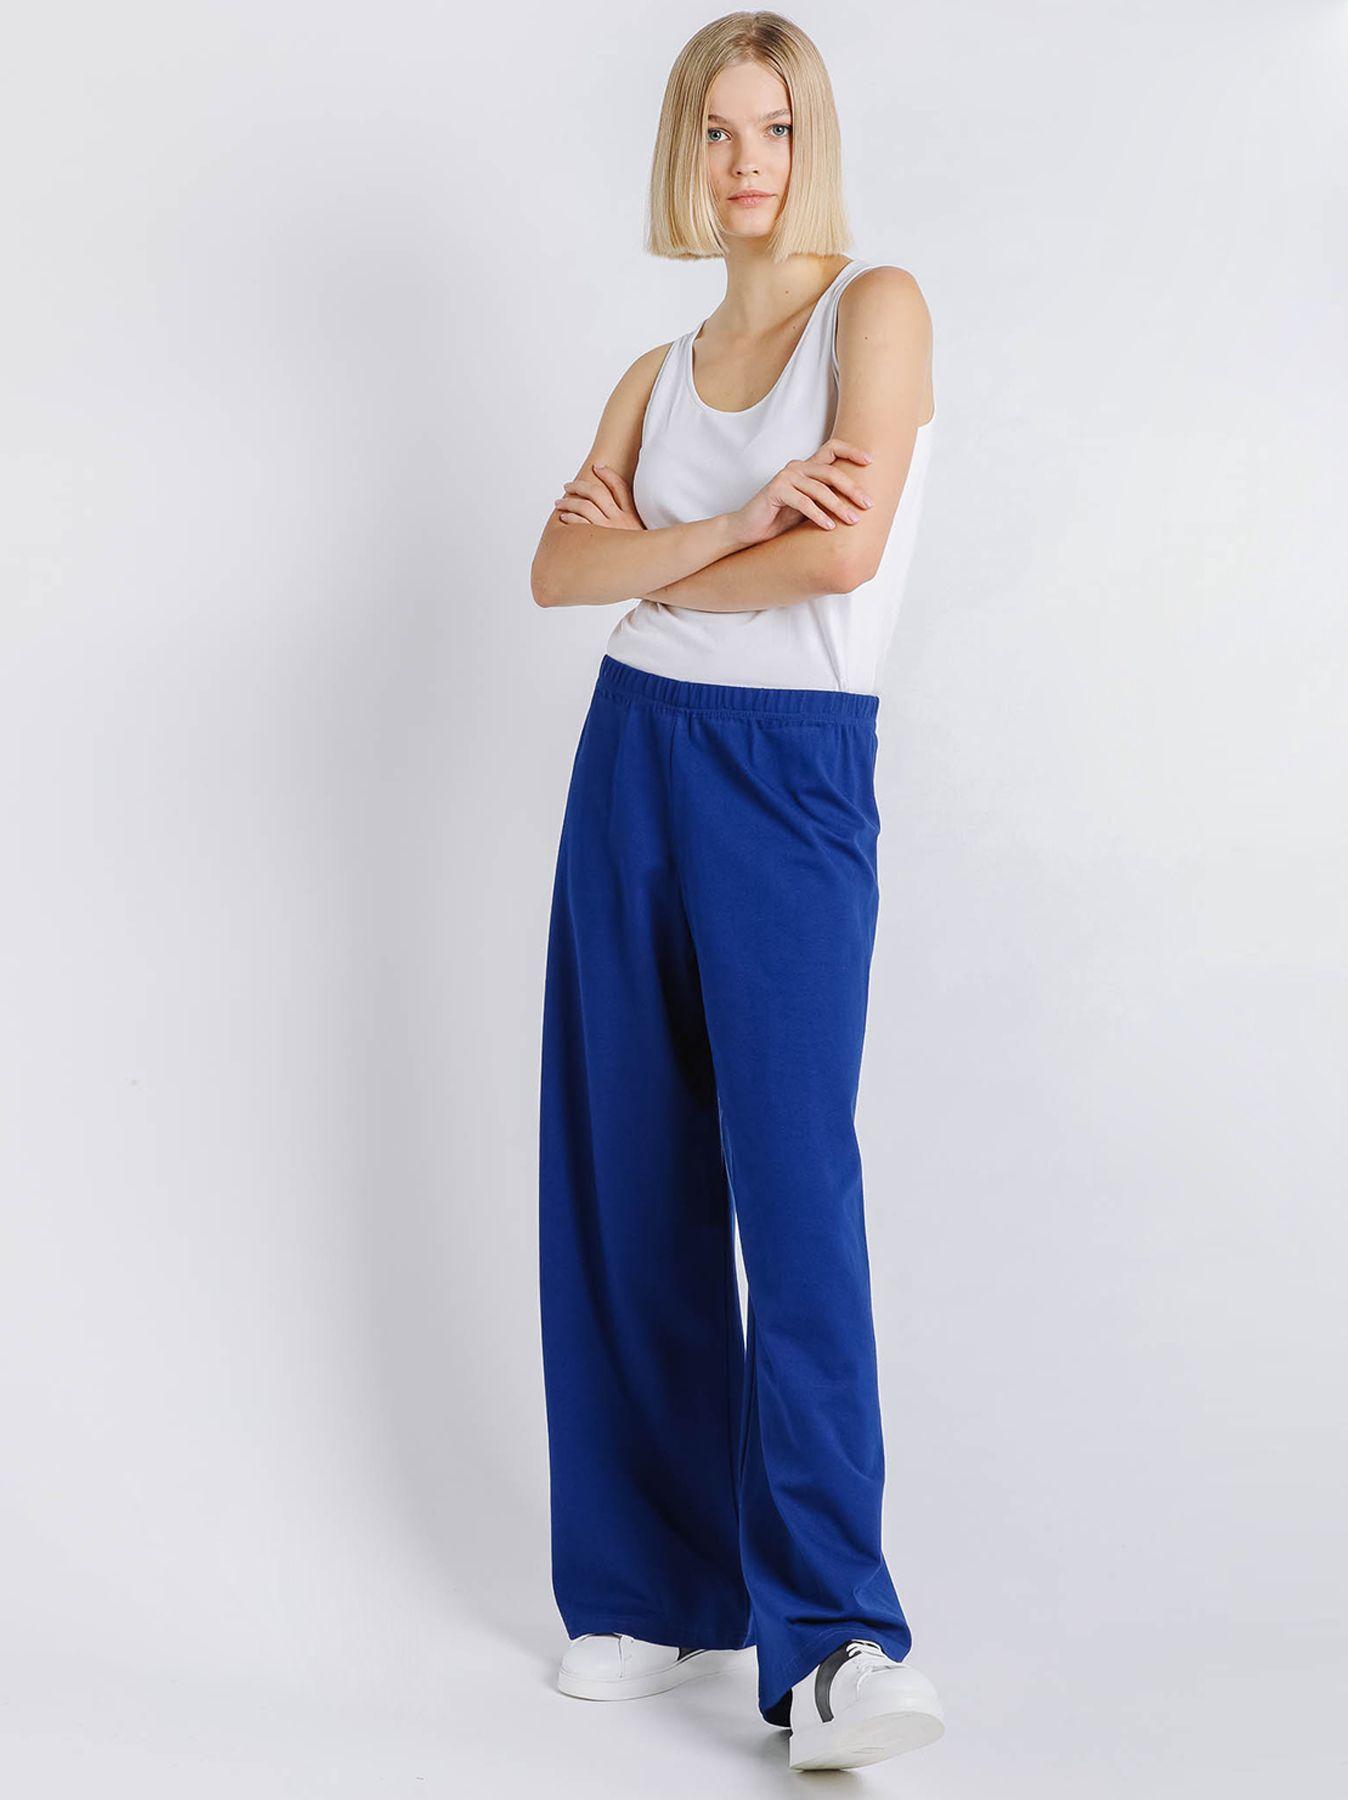 Pantalone elastico in punto Milano